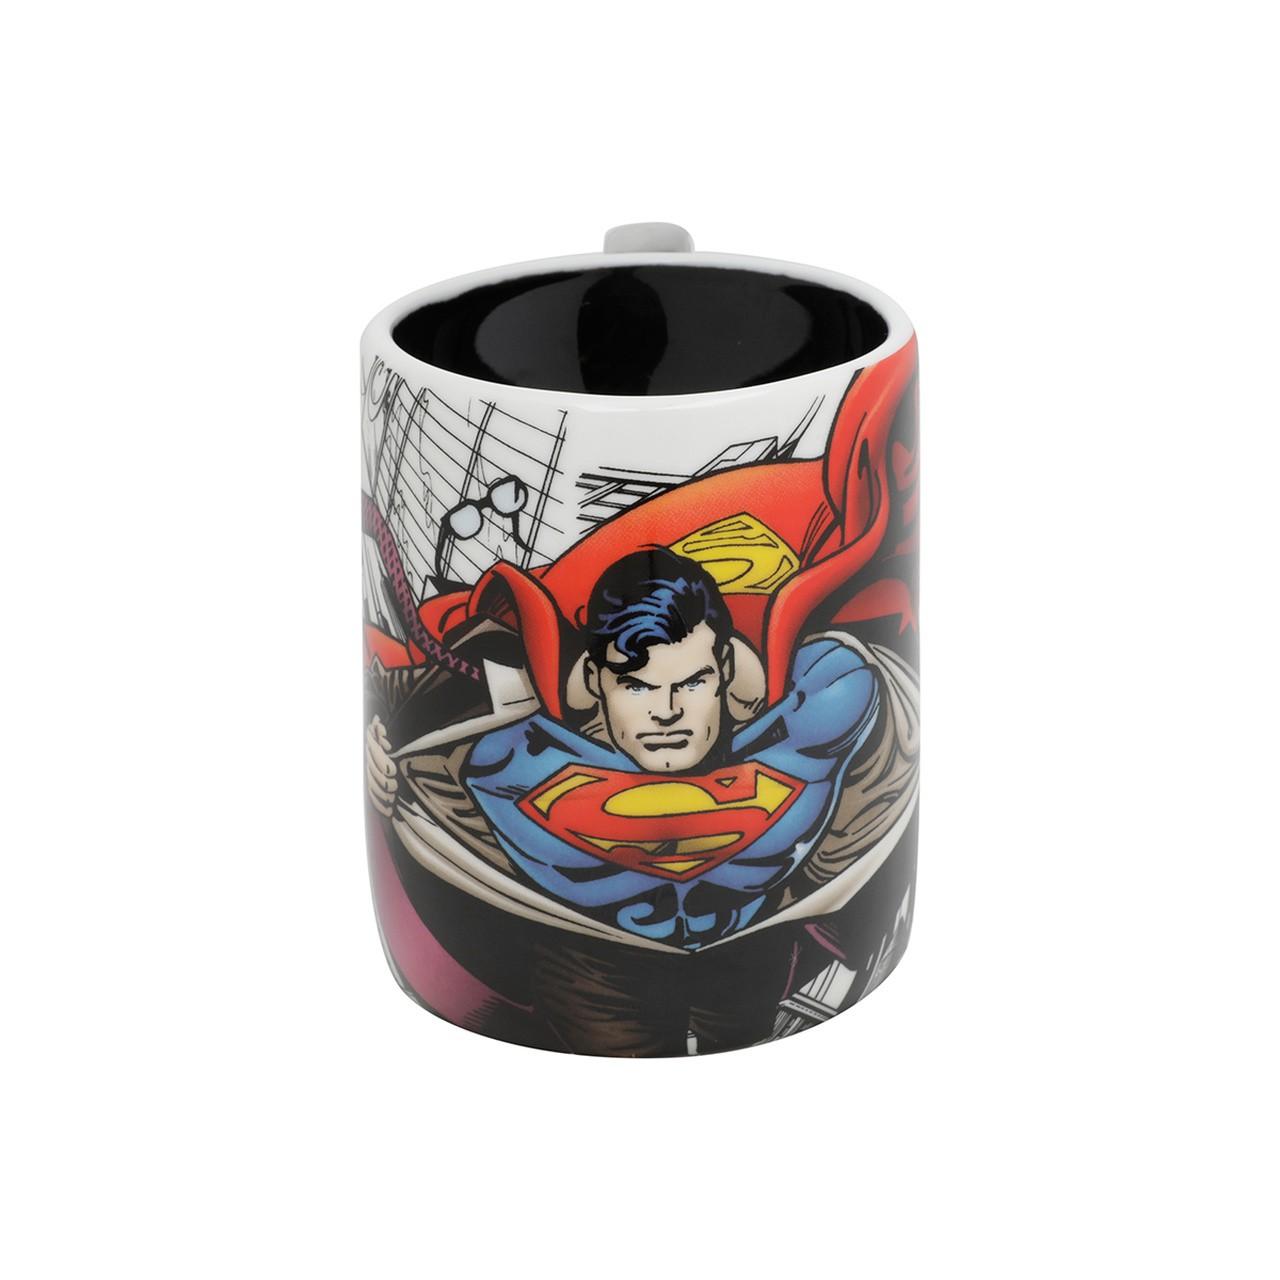 Caneca Soco Inglês Superman 380 ml - Licenciada